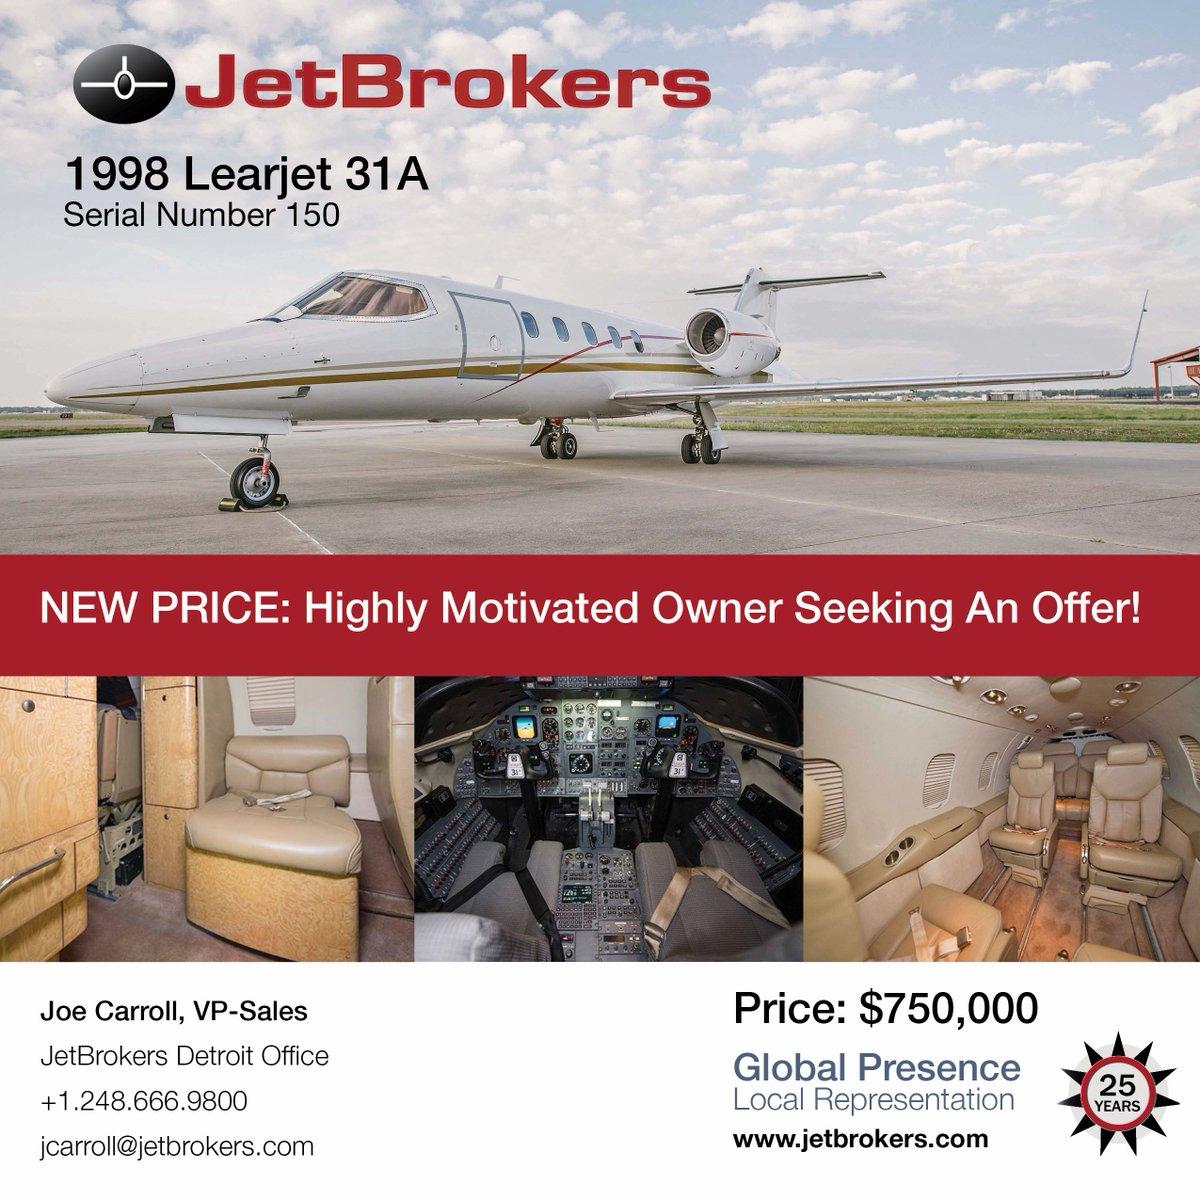 #Learjet31A sn 150 #jetforsale @JetBrokers New Price: Motivated Owners Seeks Offer! • MSP Gold • UNS 1E w/GPS &amp; Upgraded Software • Beautiful Paint/Interior • Raisbeck Aft Fuselage Locker. @JBIMichigan   Call Joe Carroll at +1 248.666.9800   https://www. jetbrokers.com/Learjet31A-150 .html &nbsp; … <br>http://pic.twitter.com/50yfaqp2hz